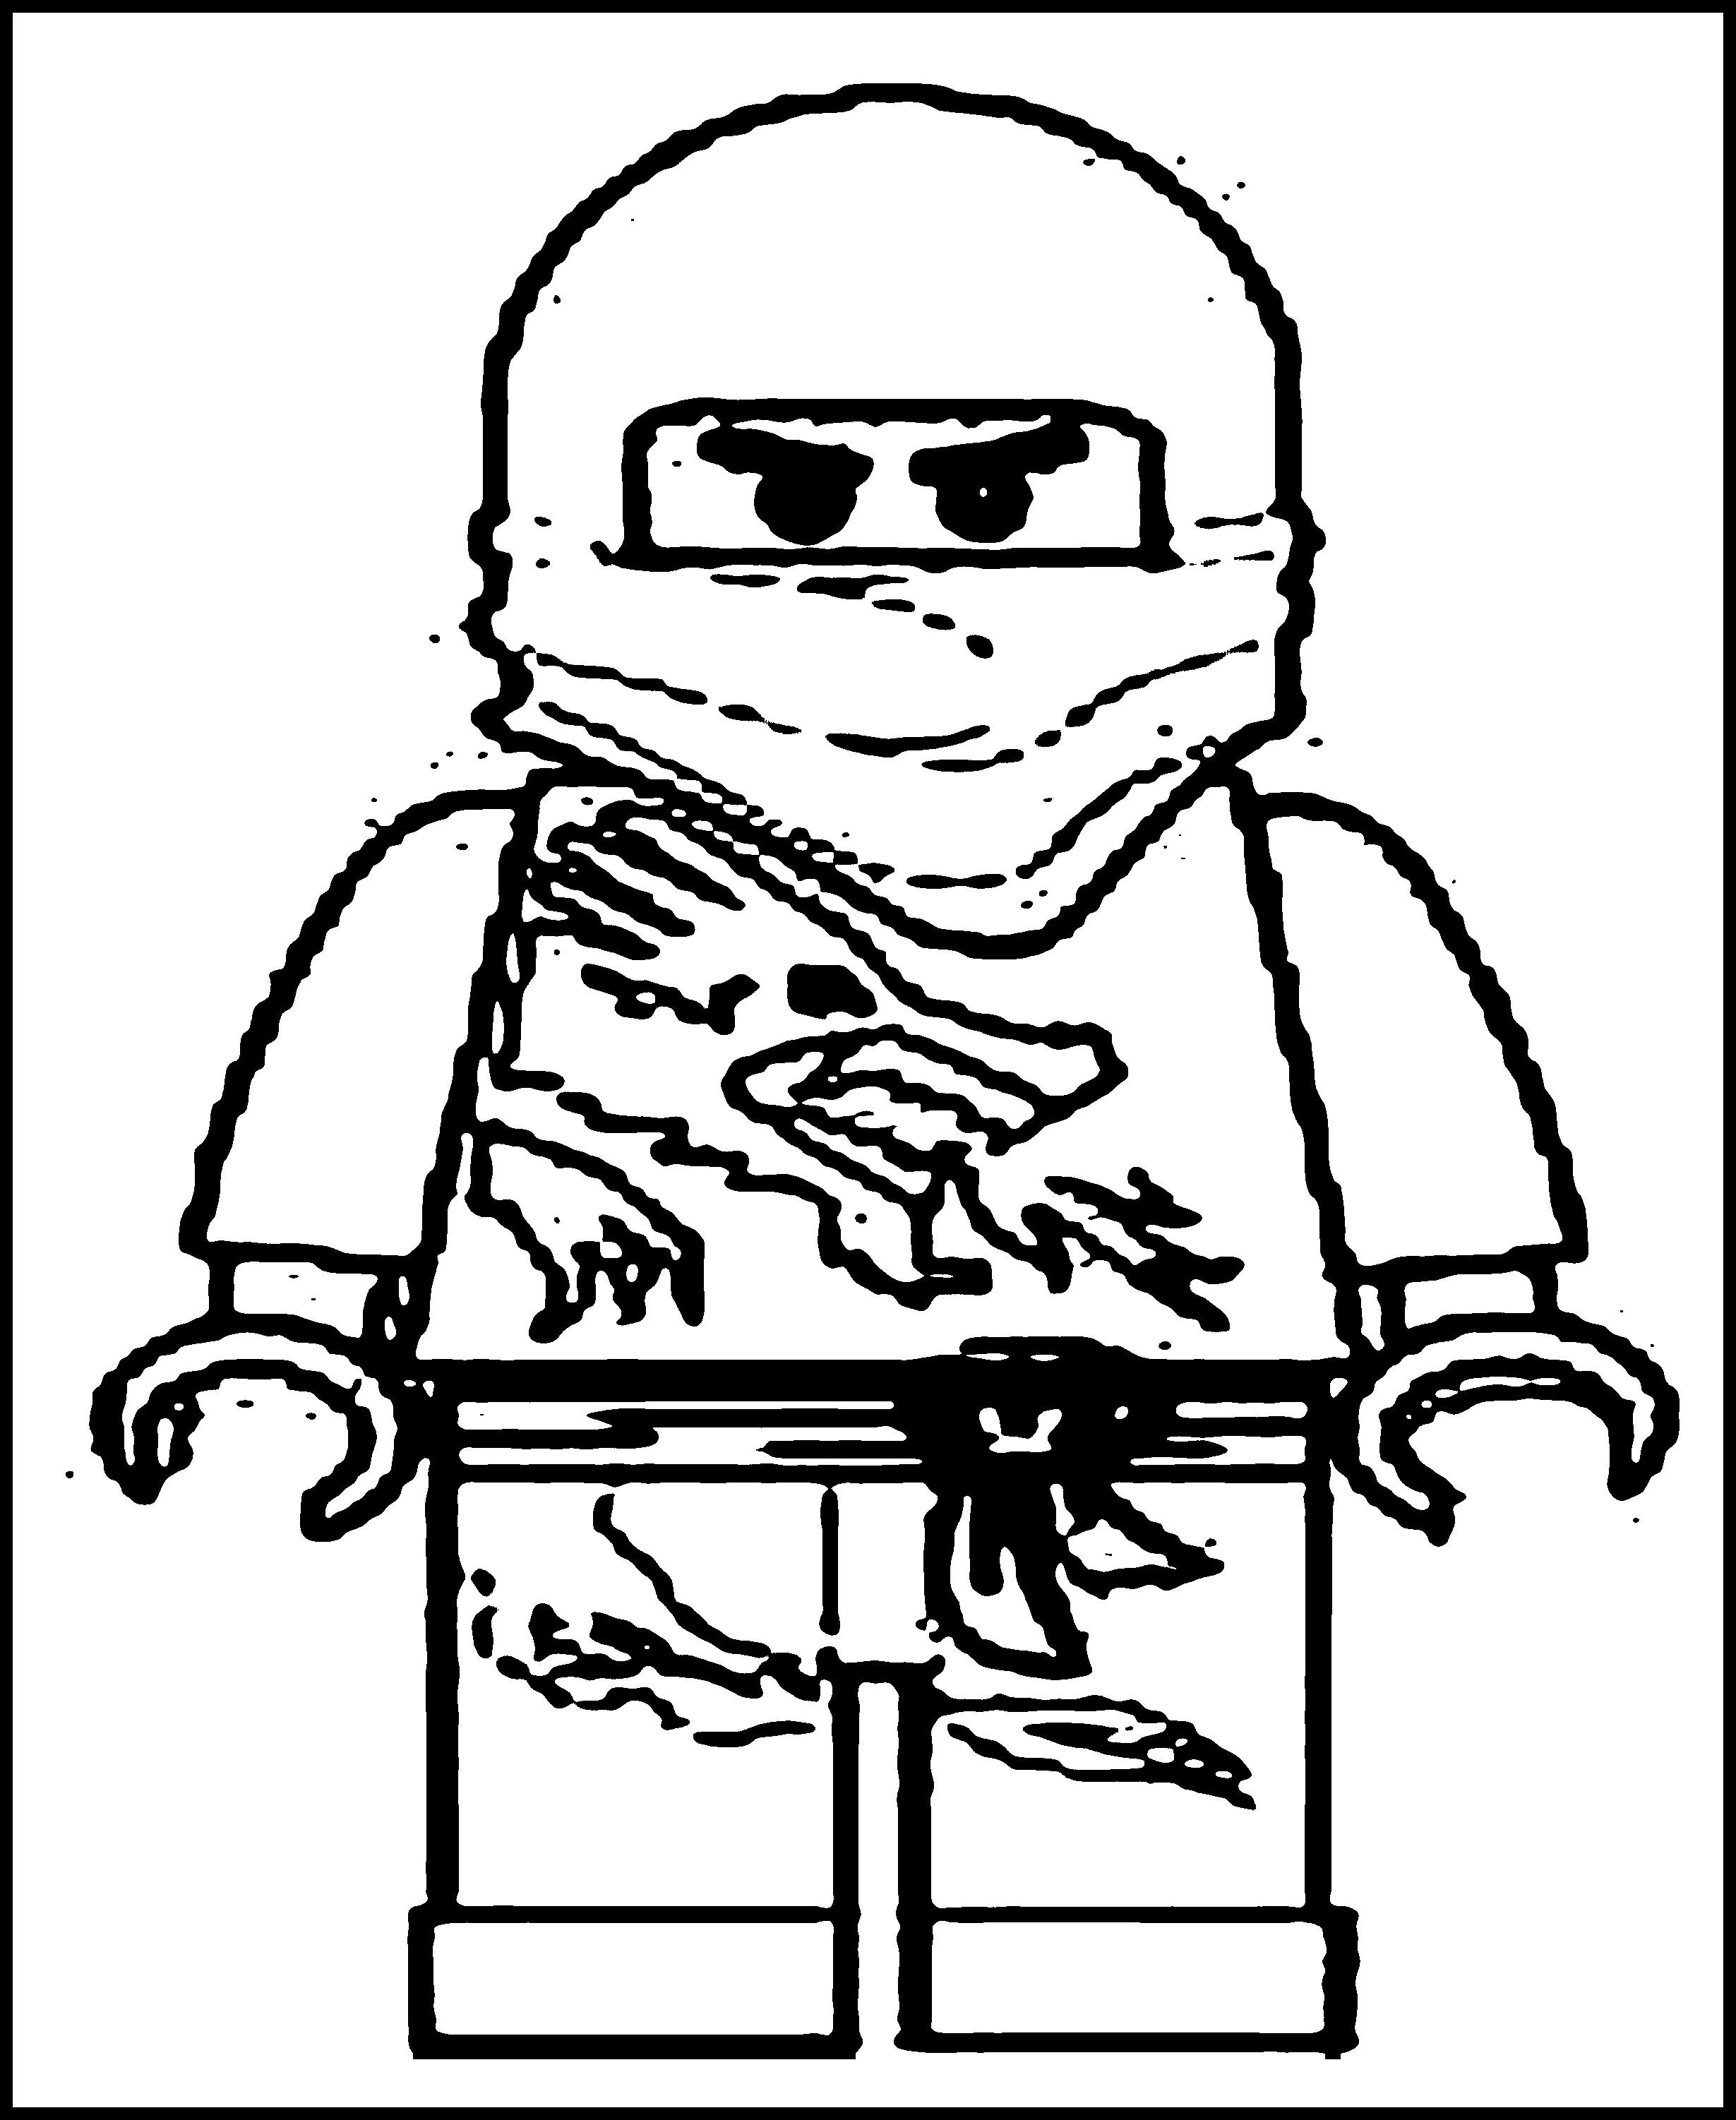 2459x3003 Lego Ninjago Coloring Pages Lego Ninjago Free Lego Ninjago